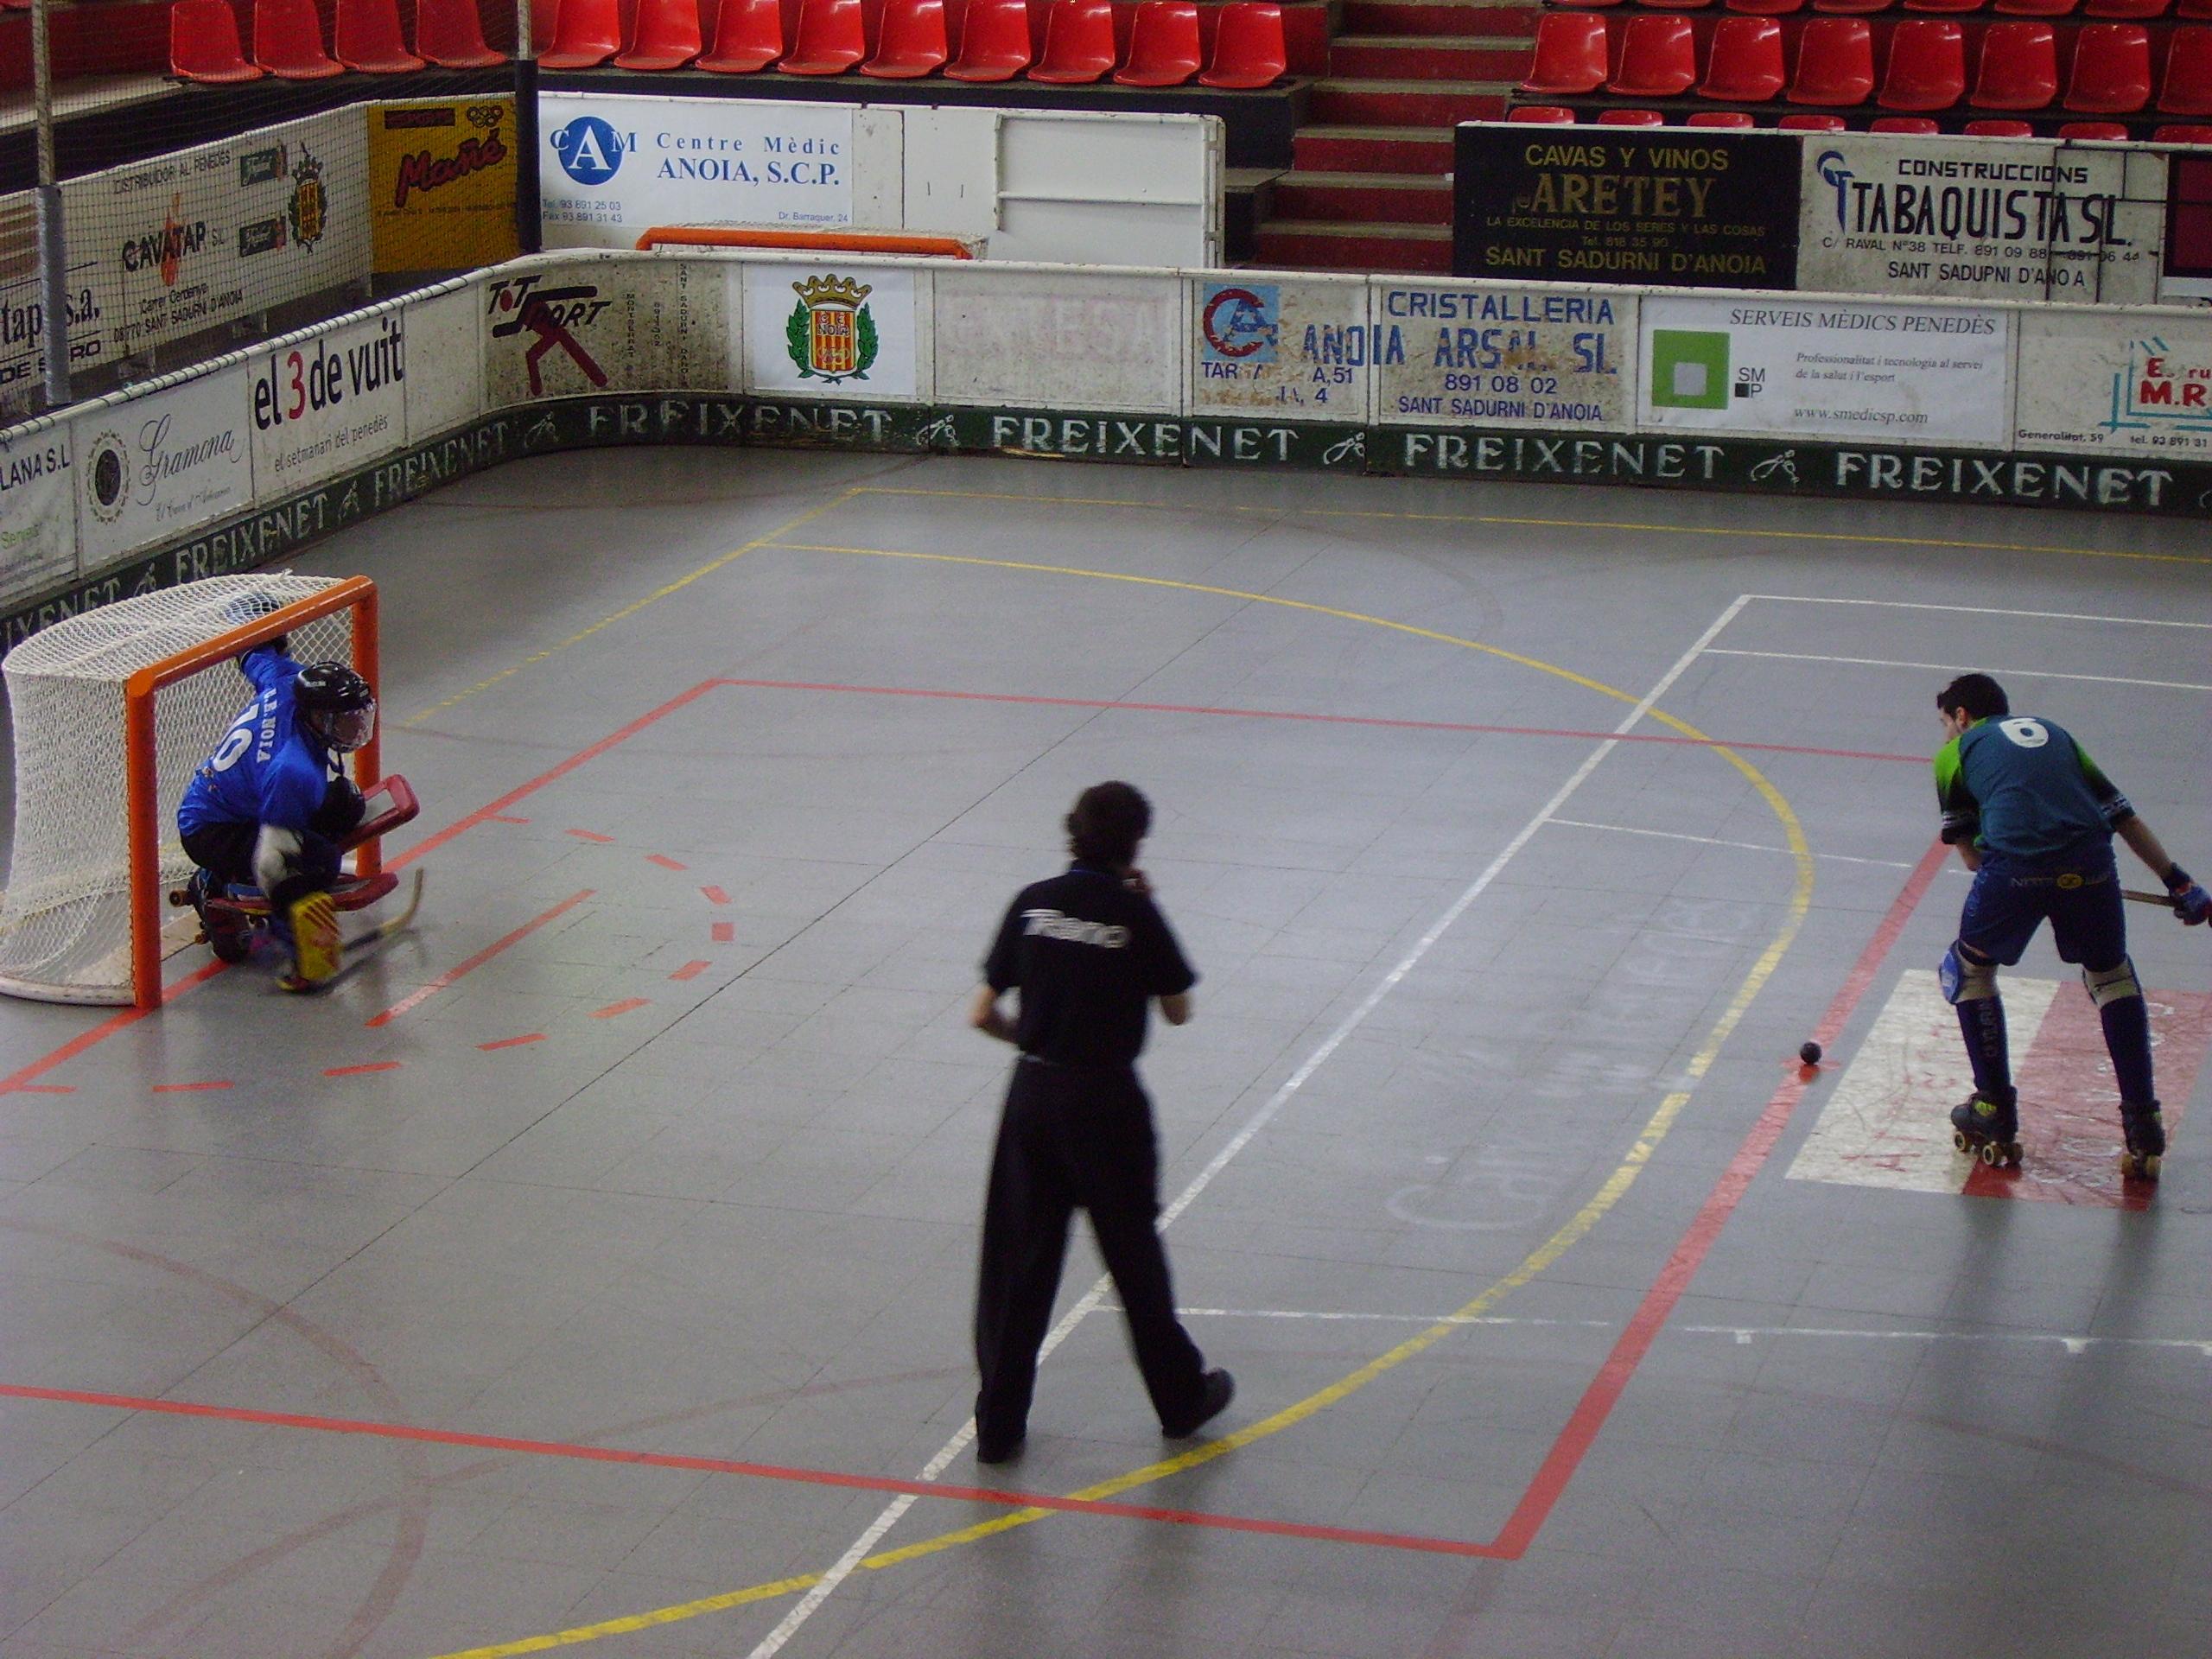 Filehoquei patins penal roller hockeyg wikimedia commons filehoquei patins penal roller hockeyg malvernweather Choice Image